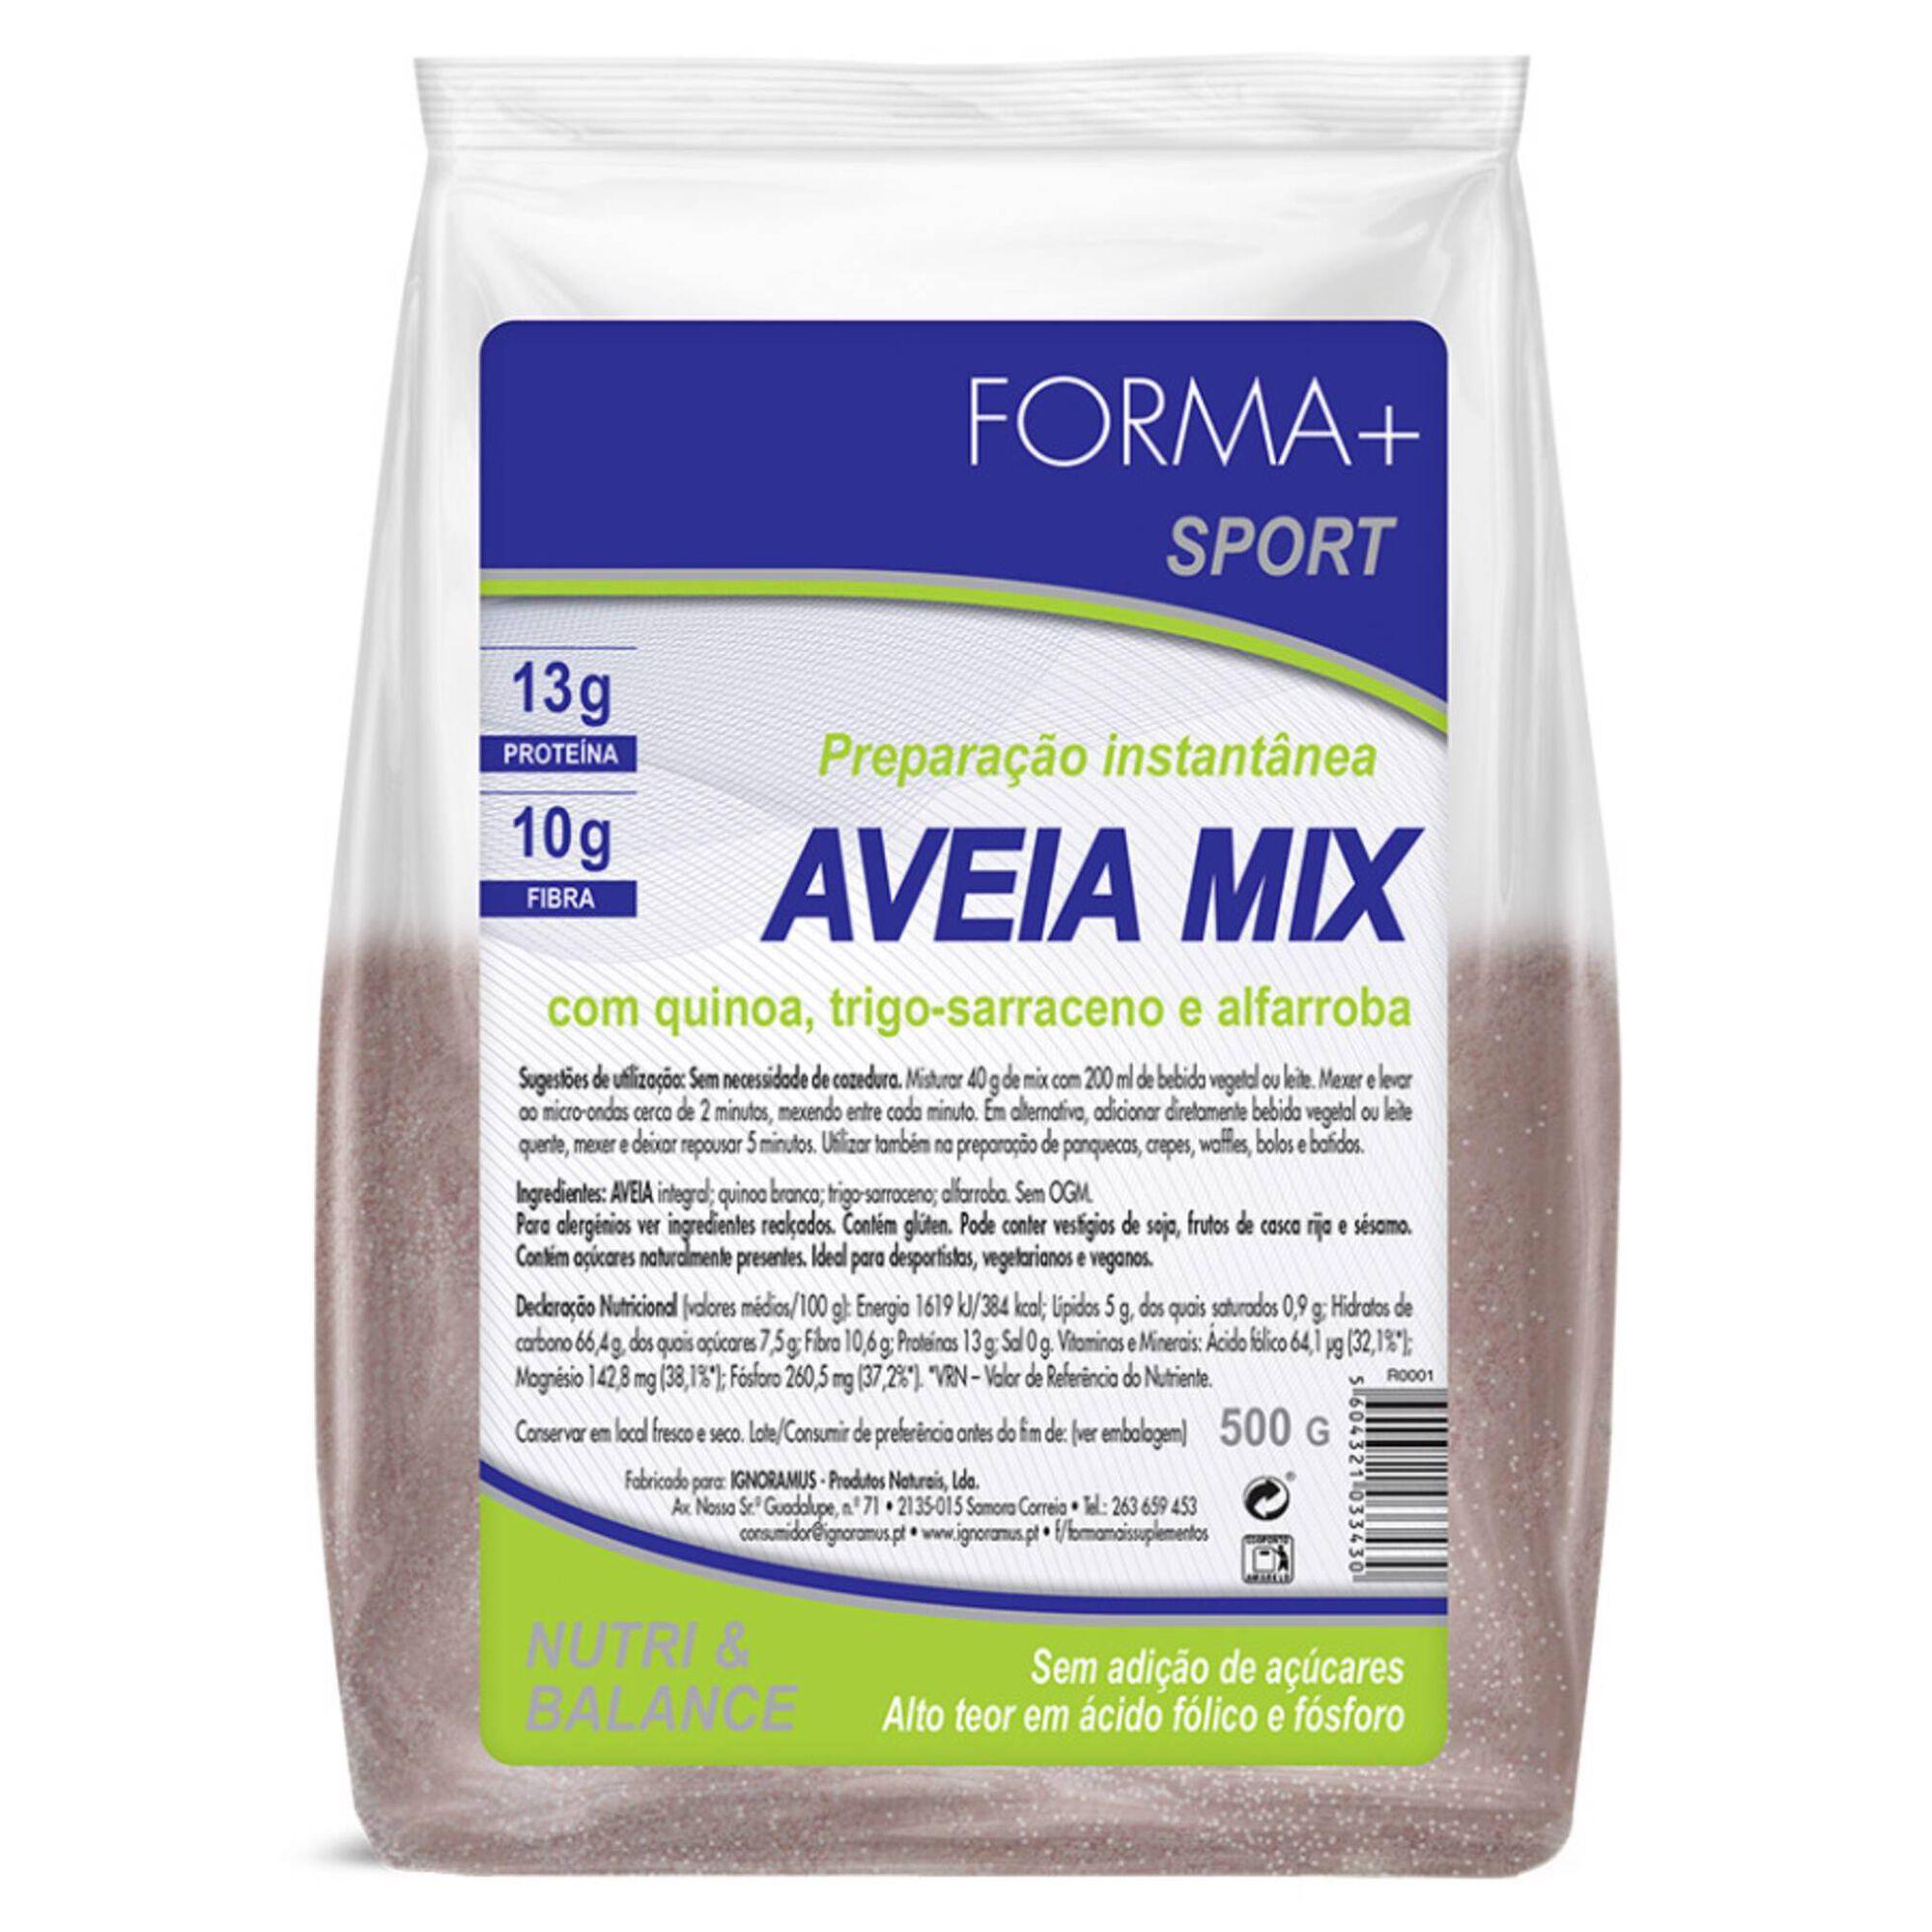 Aveia Mix